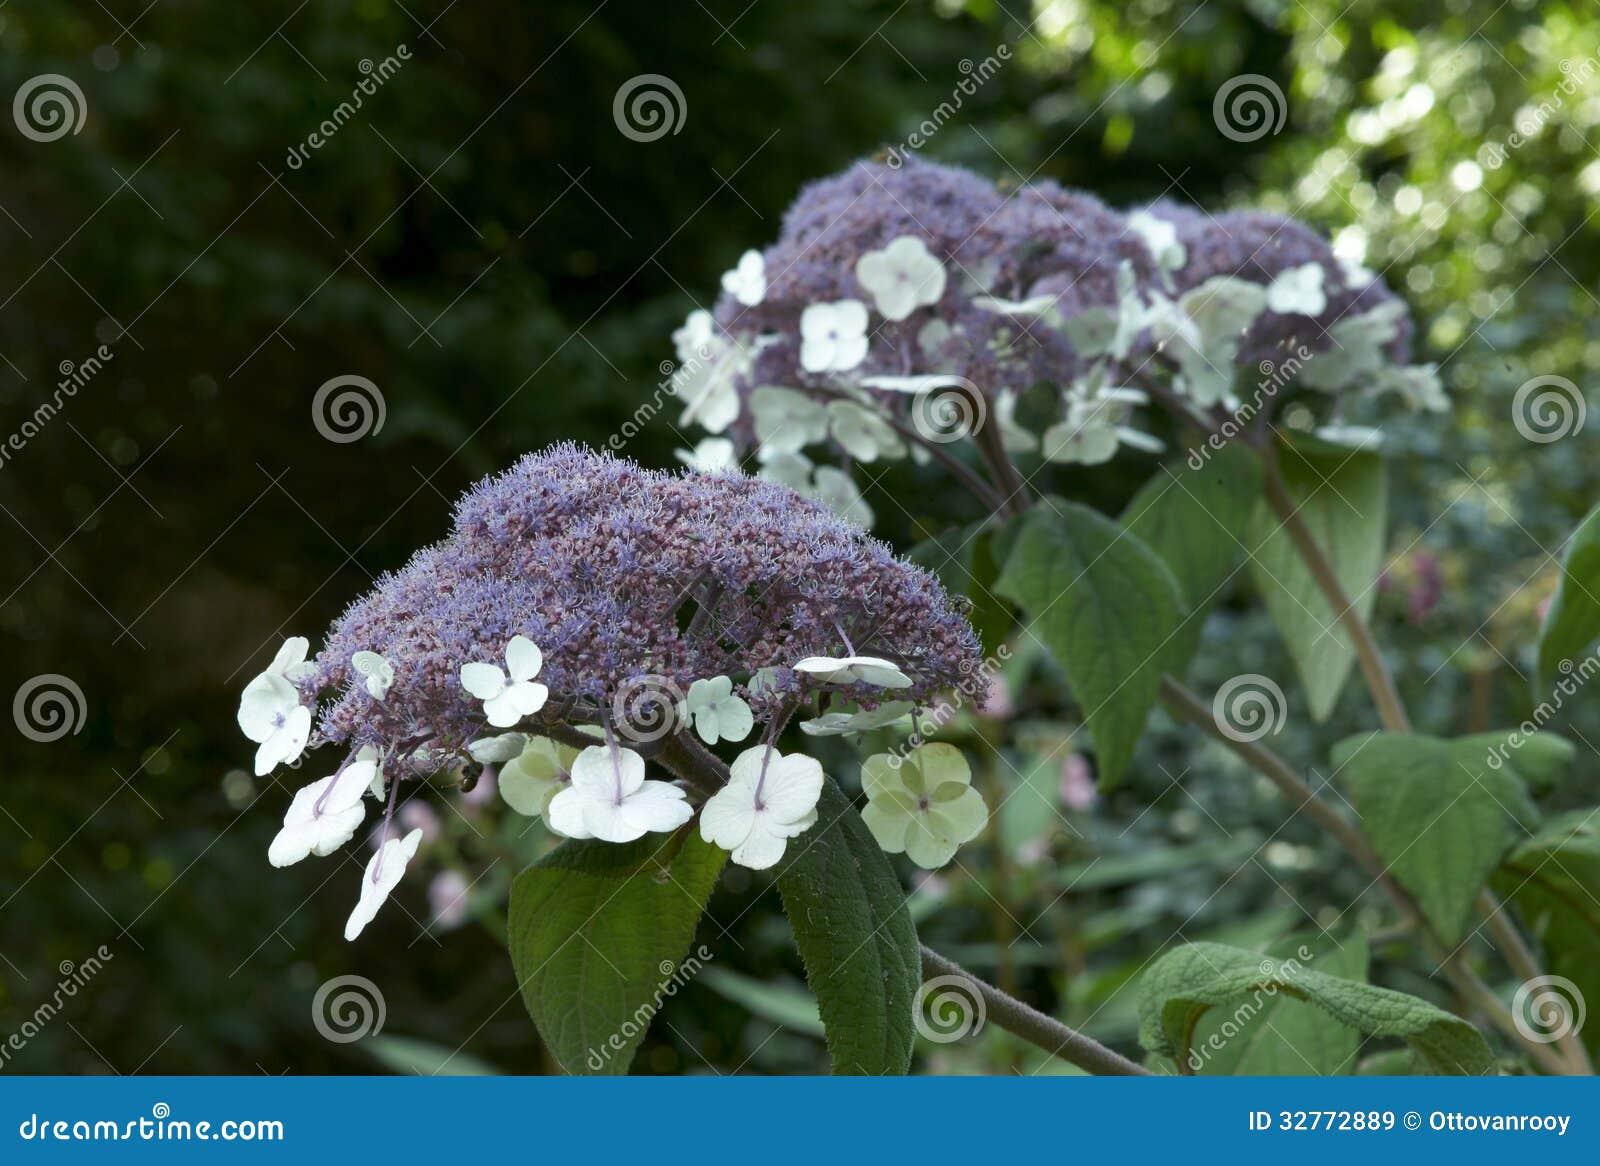 hydrangea aspera macrophylla royalty free stock images. Black Bedroom Furniture Sets. Home Design Ideas